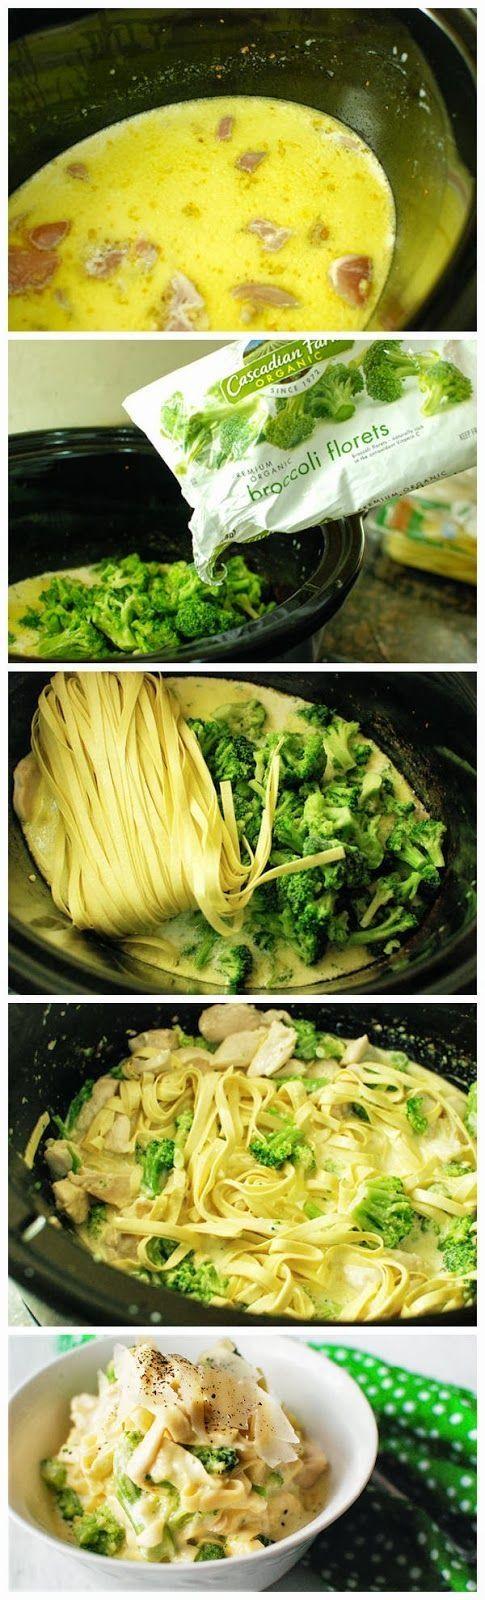 Slow Cooker Chicken Fettuccine Alfredo   Recipes   Pinterest